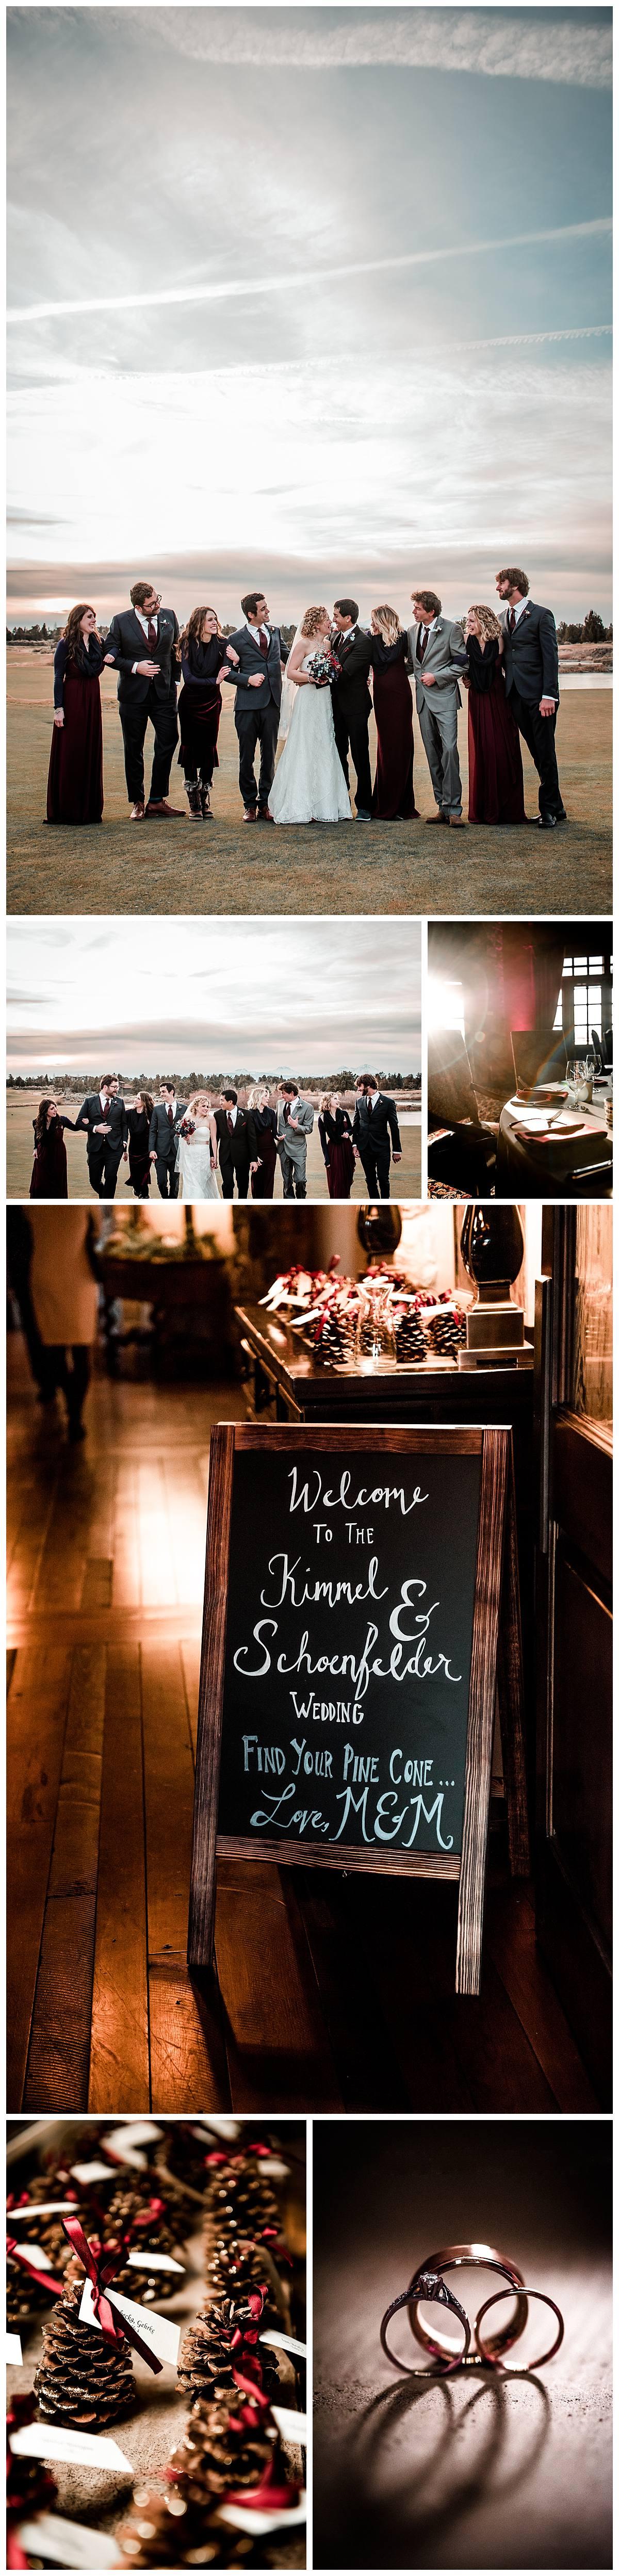 Pronghorn resort wedding photographs